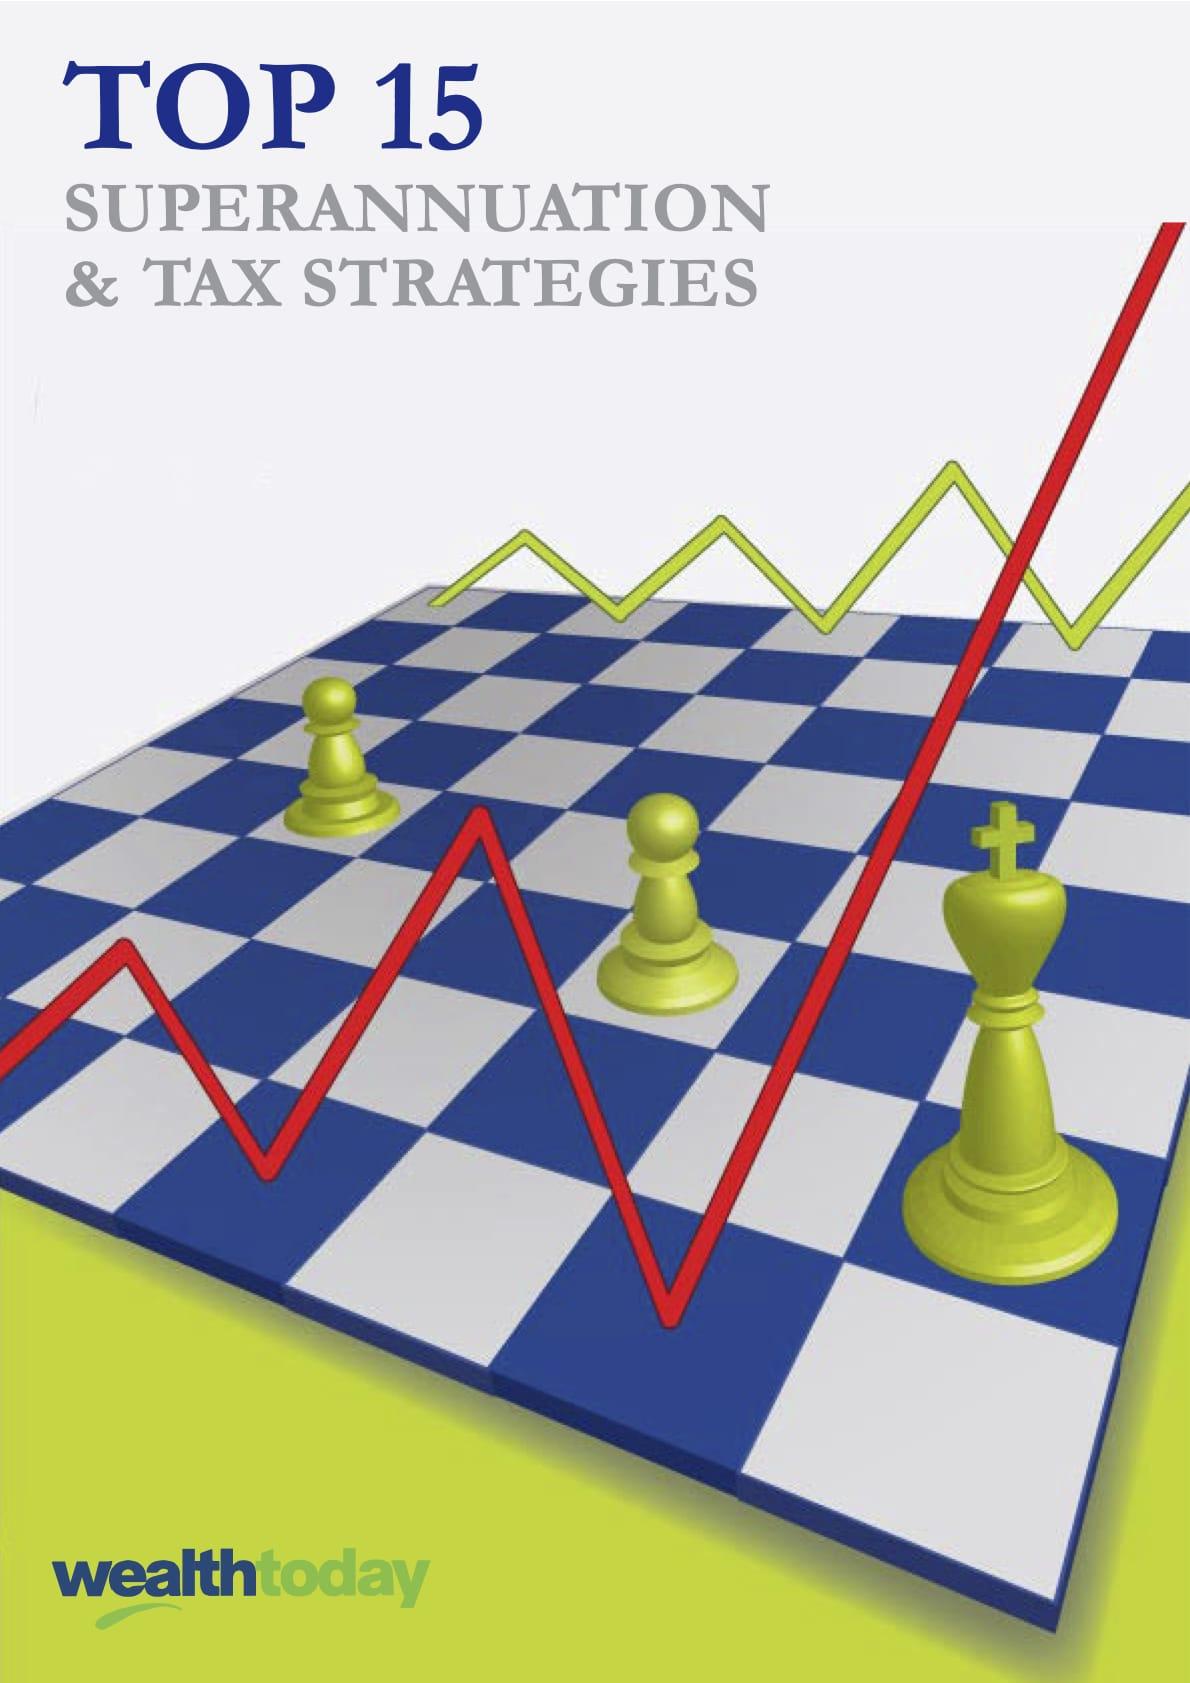 Top-15-Superannuation-Tax-Strategies-Aug-2017-WT-Form-201810